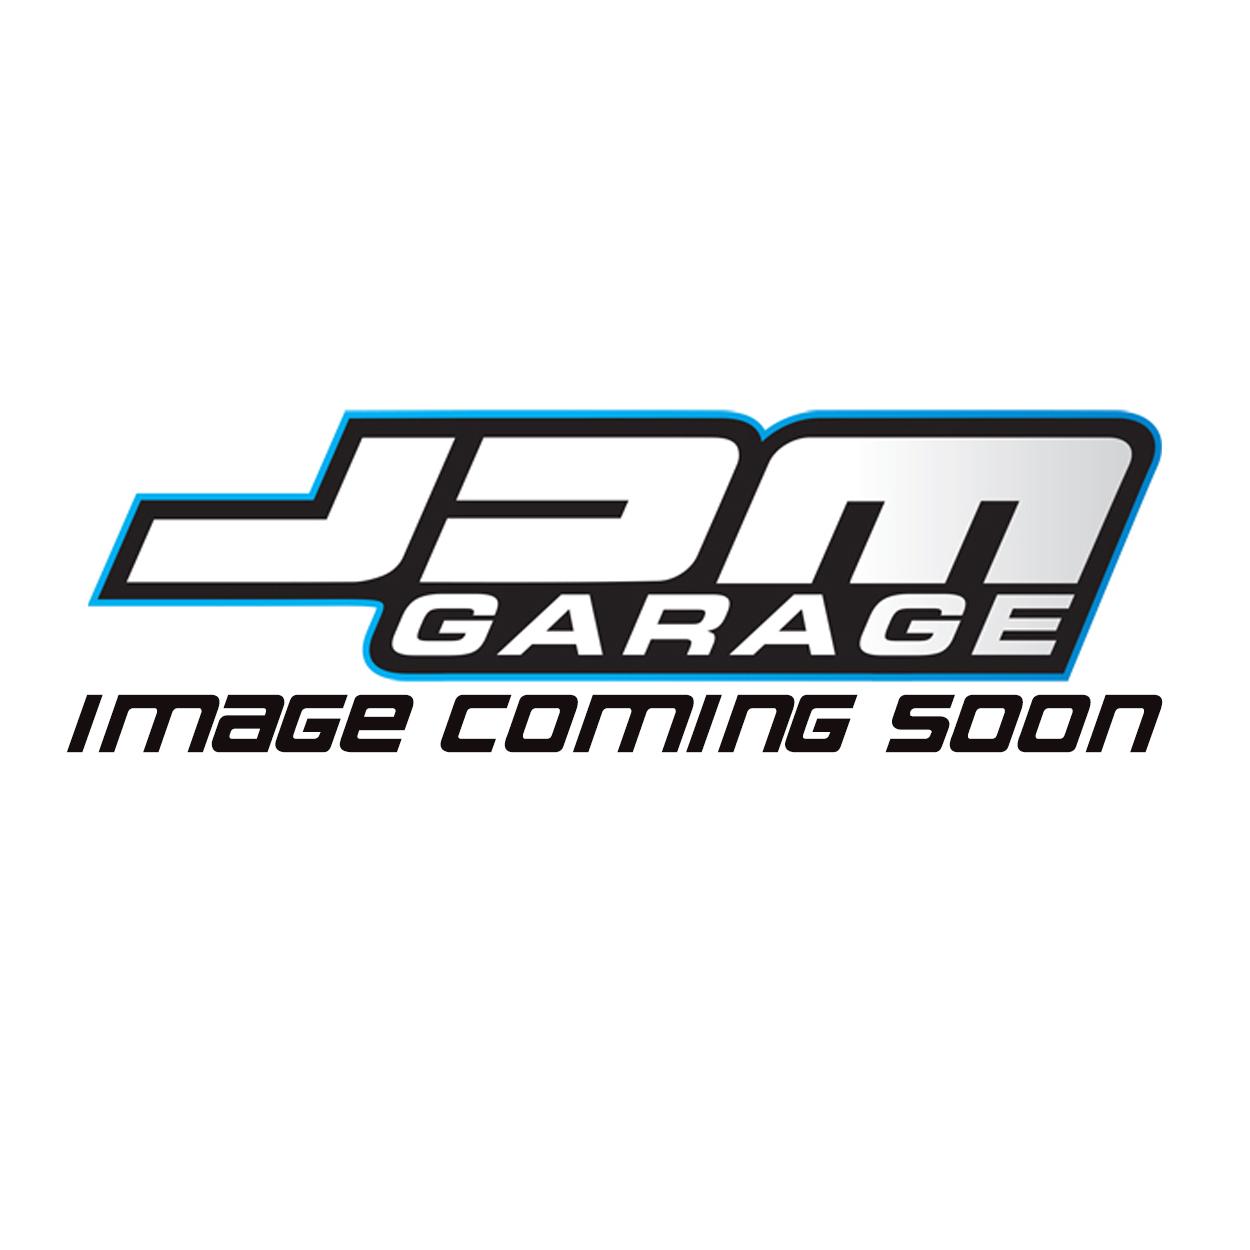 JdmGarageUK Steel Lambda Bung M12 x 1.25 17mm